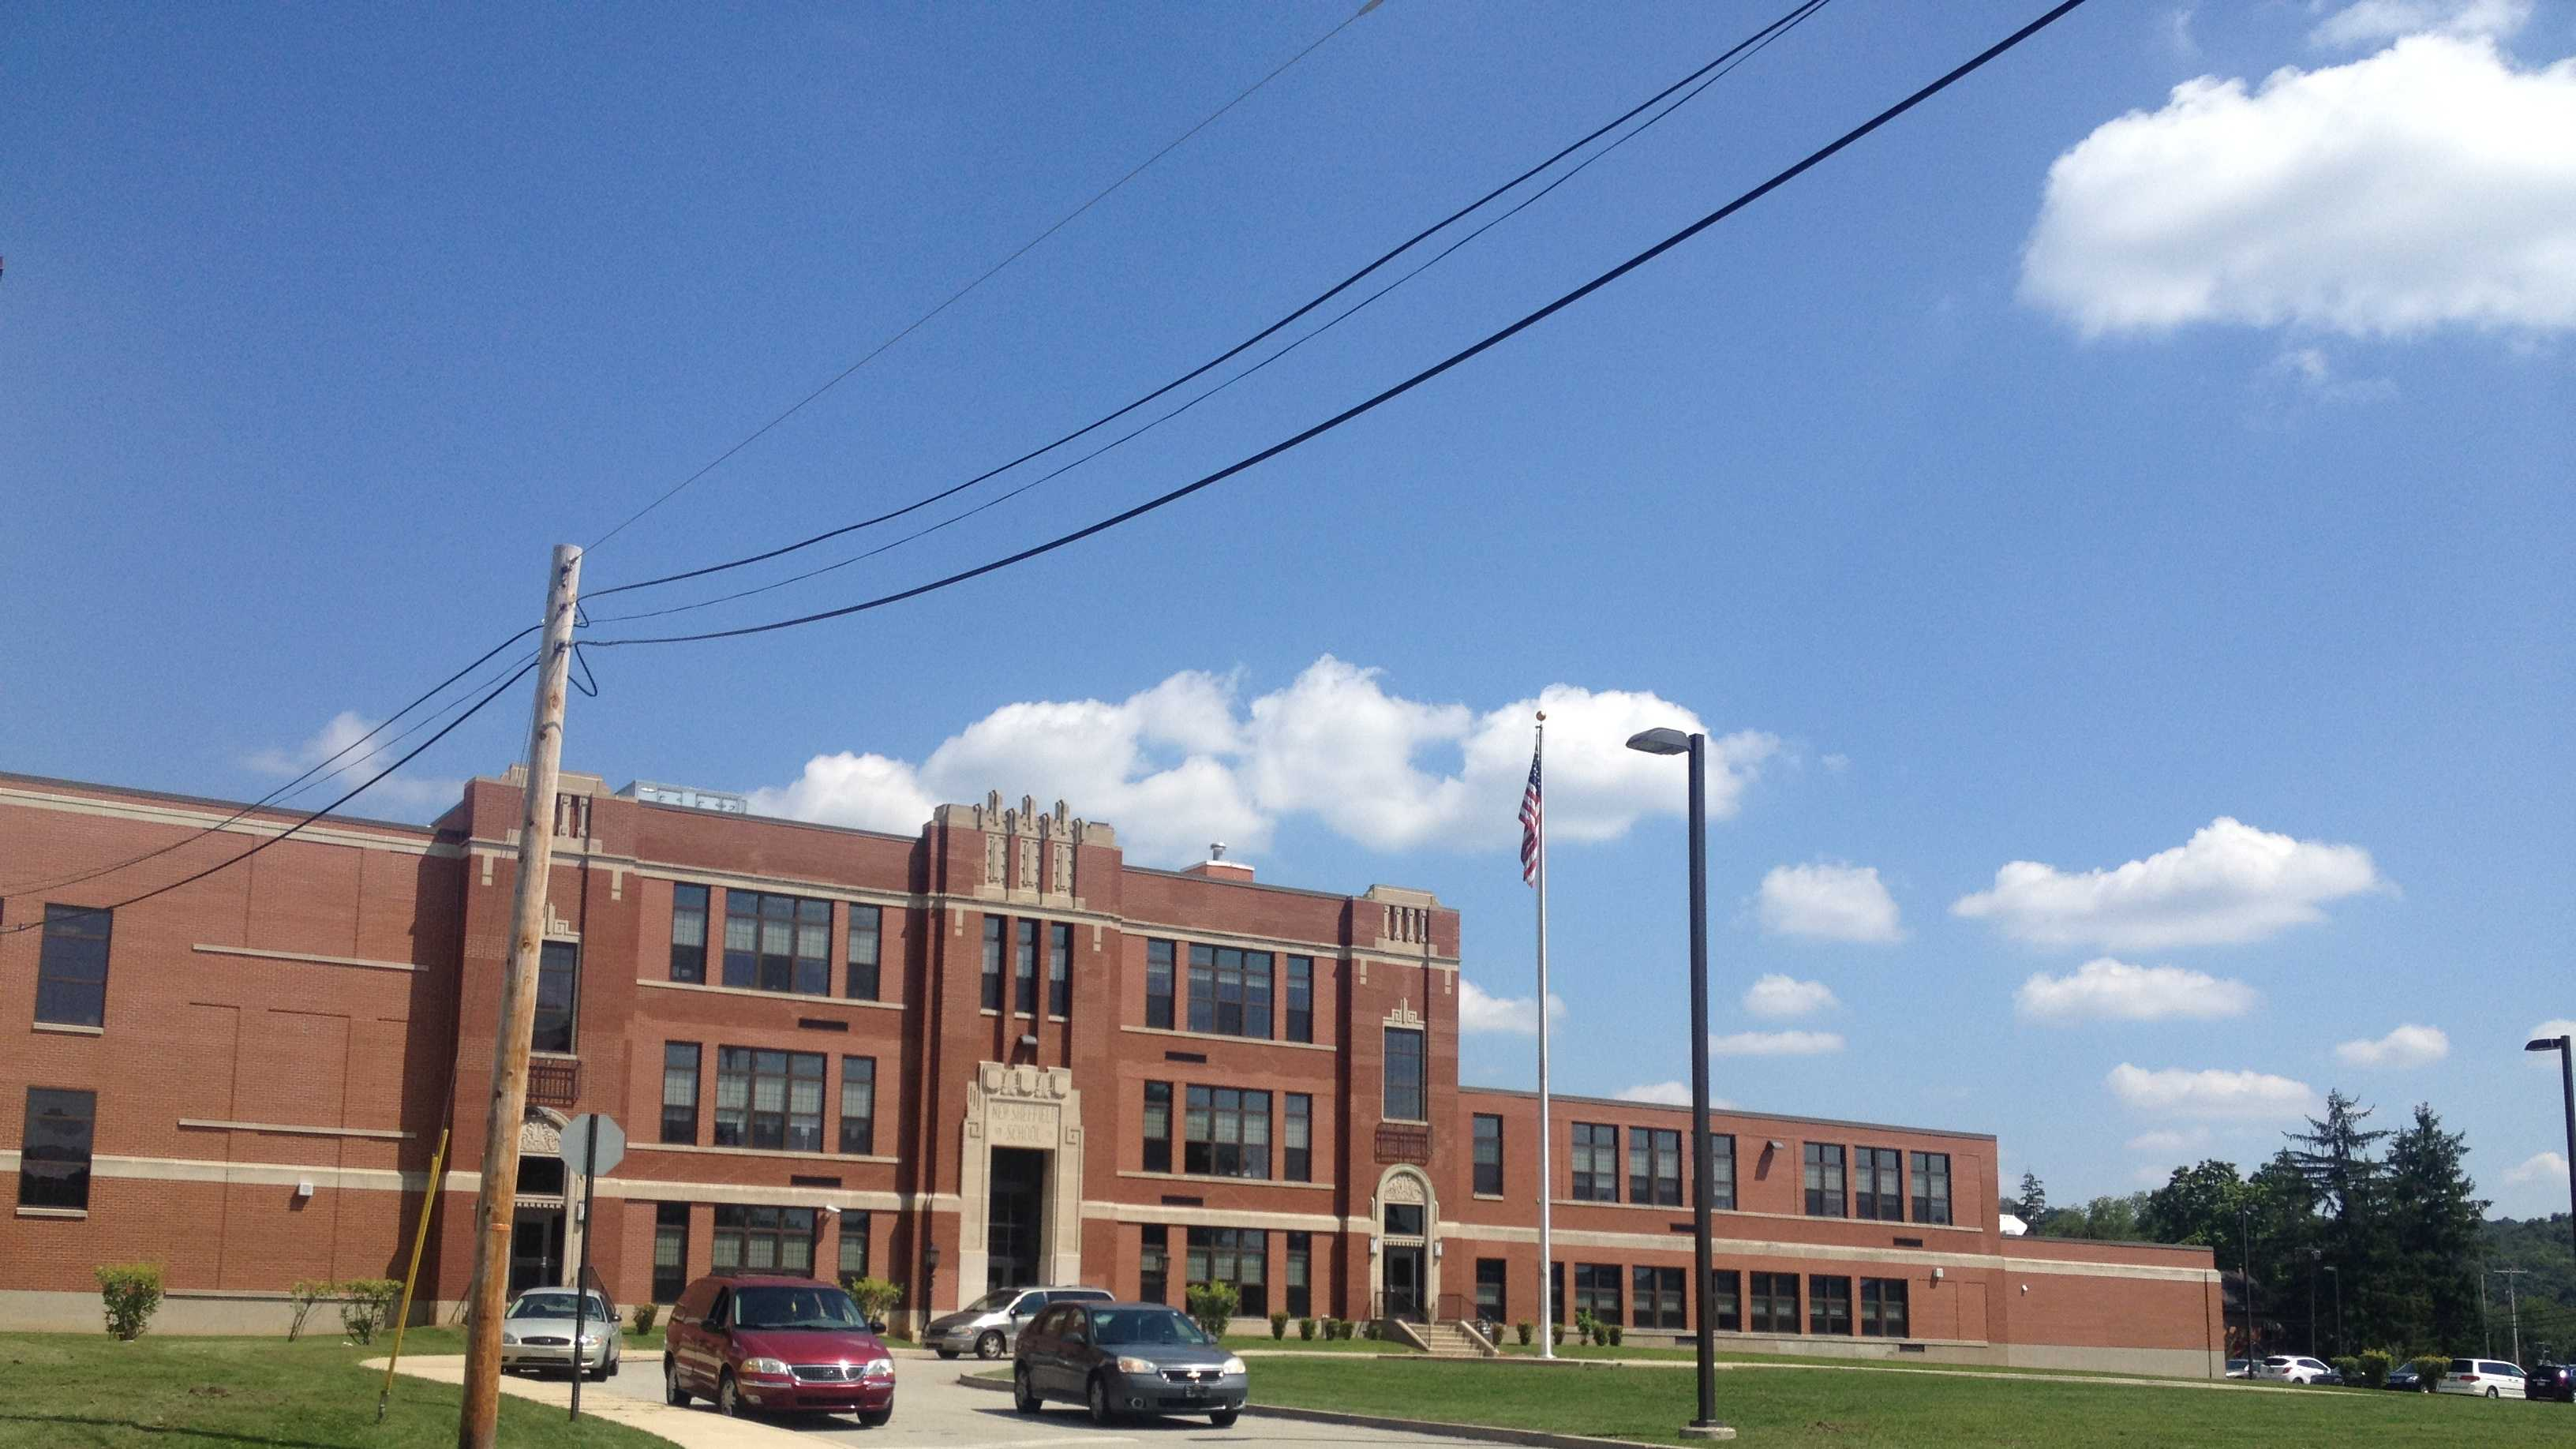 Aliquippa Elementary School